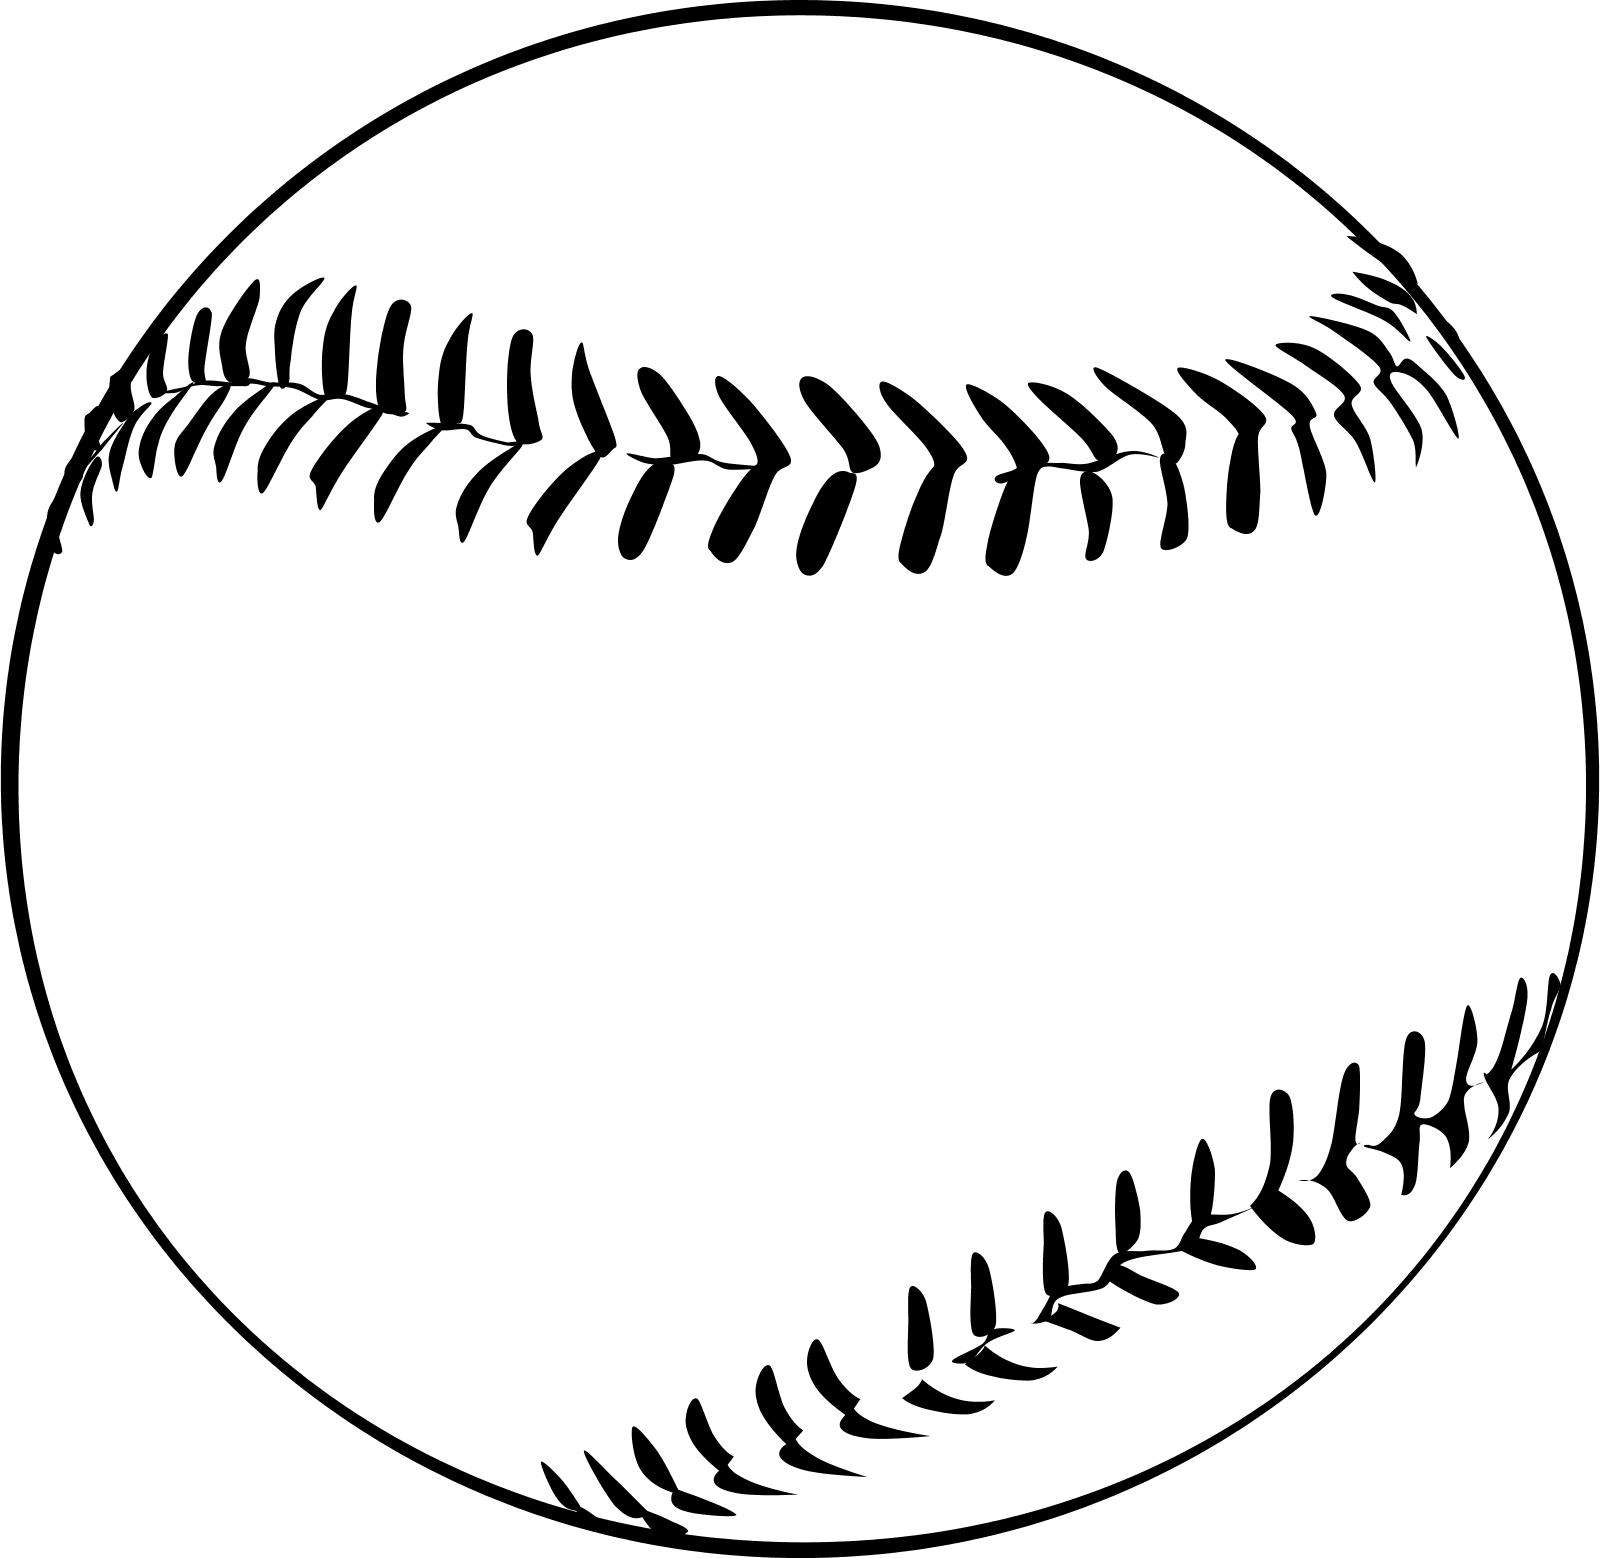 Baseball Clipart Vector .-Baseball Clipart Vector .-3